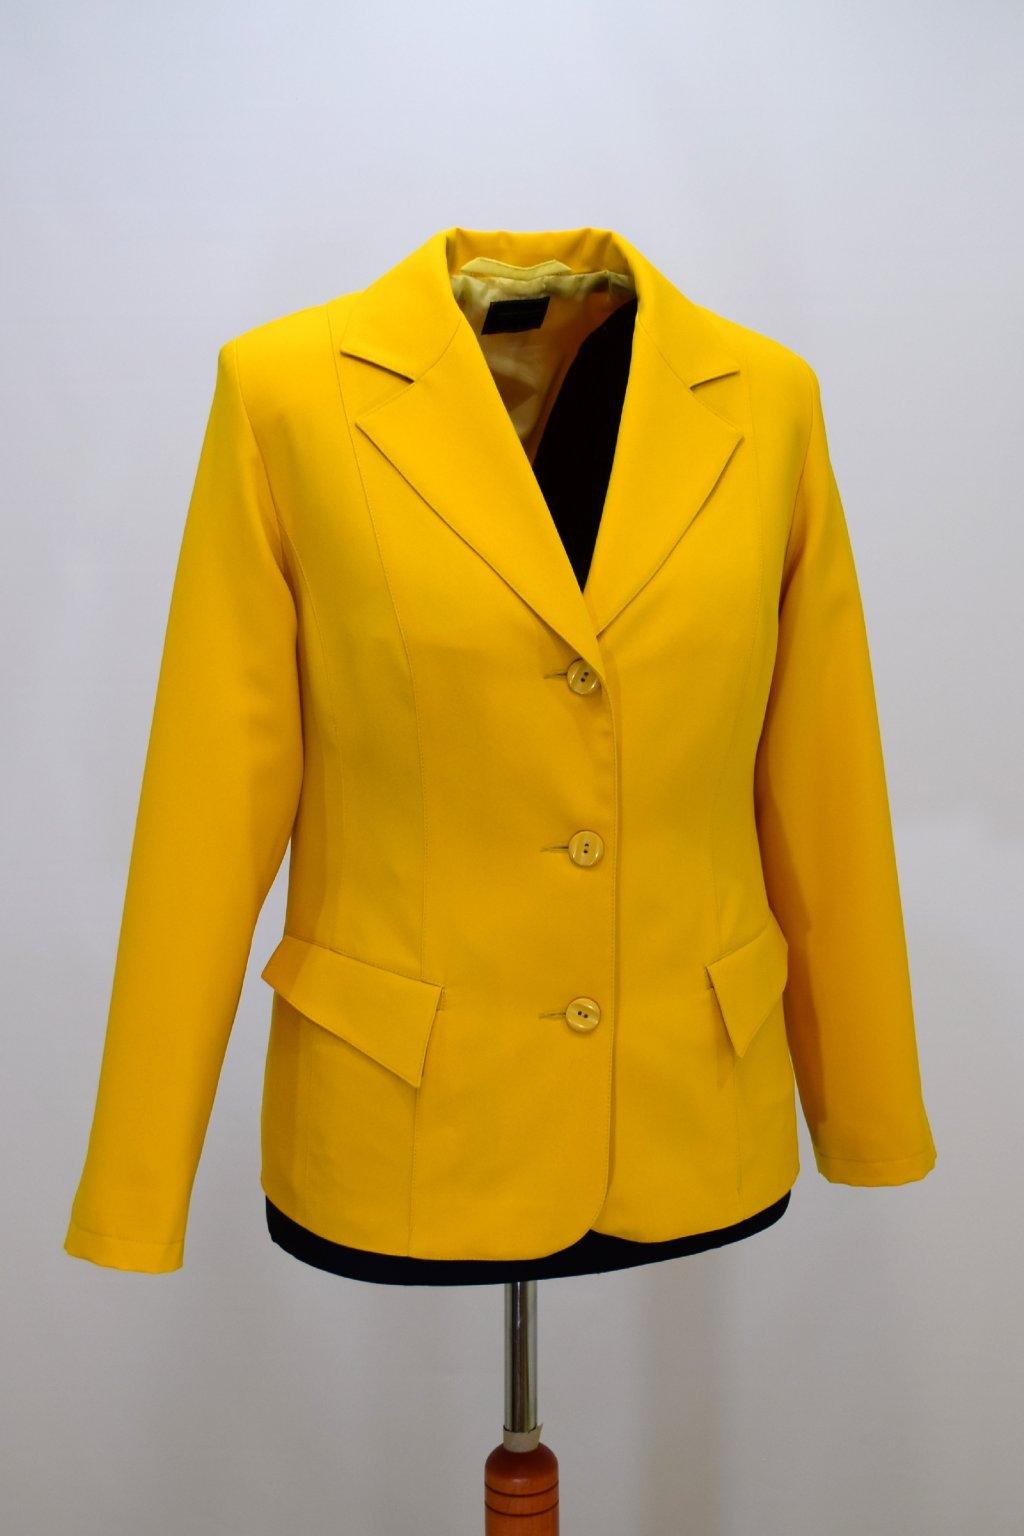 Dámské žluté sako Manon.